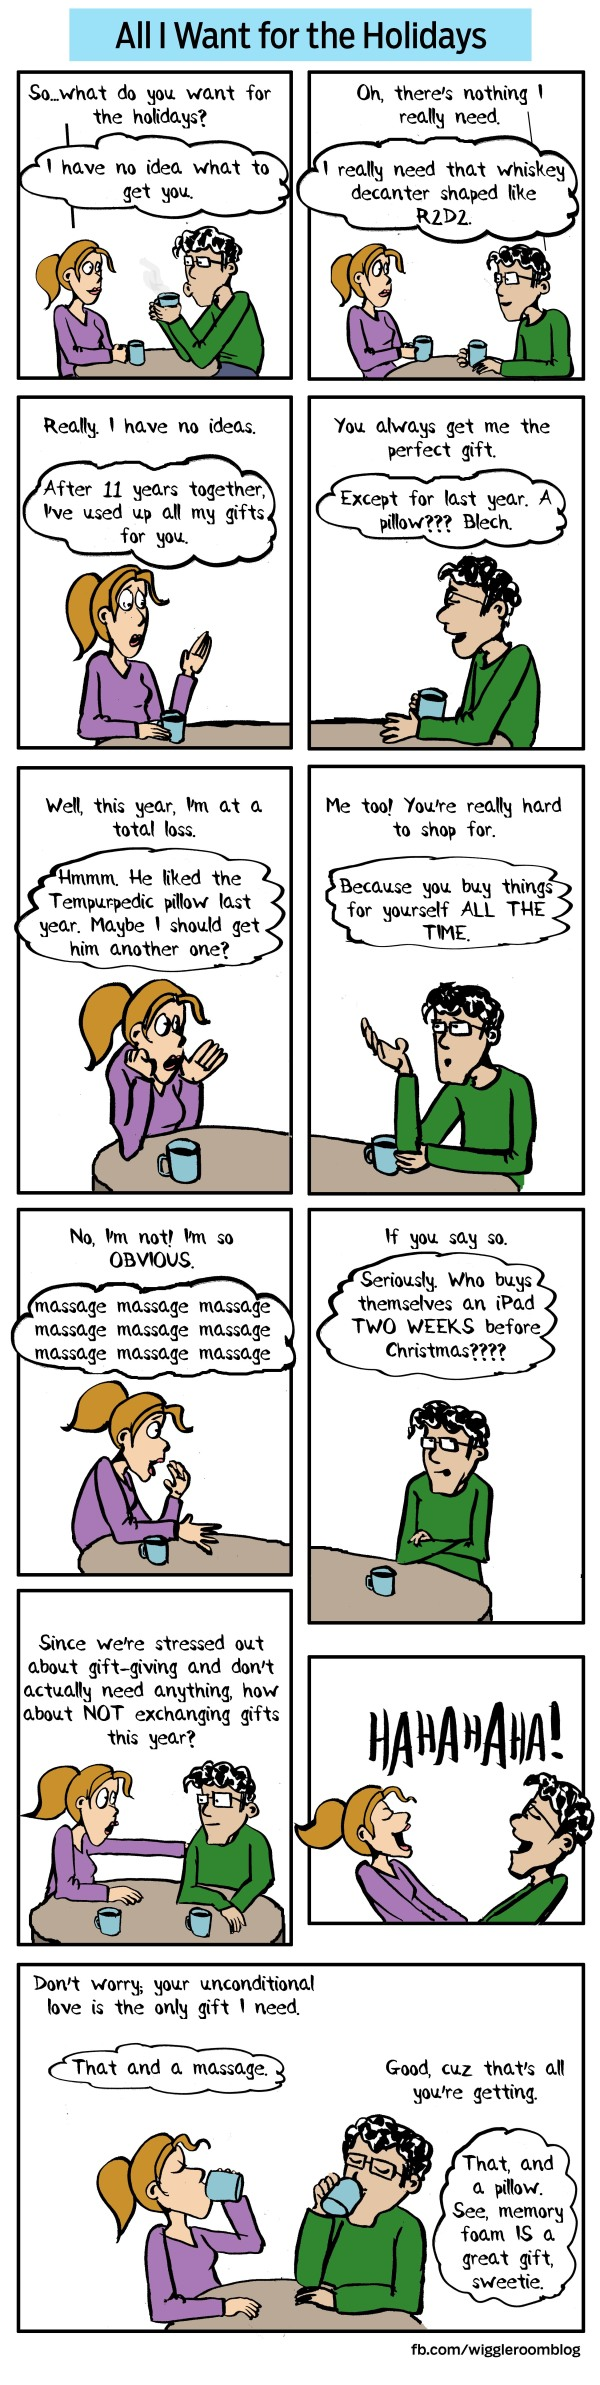 passive-aggressive-gifting